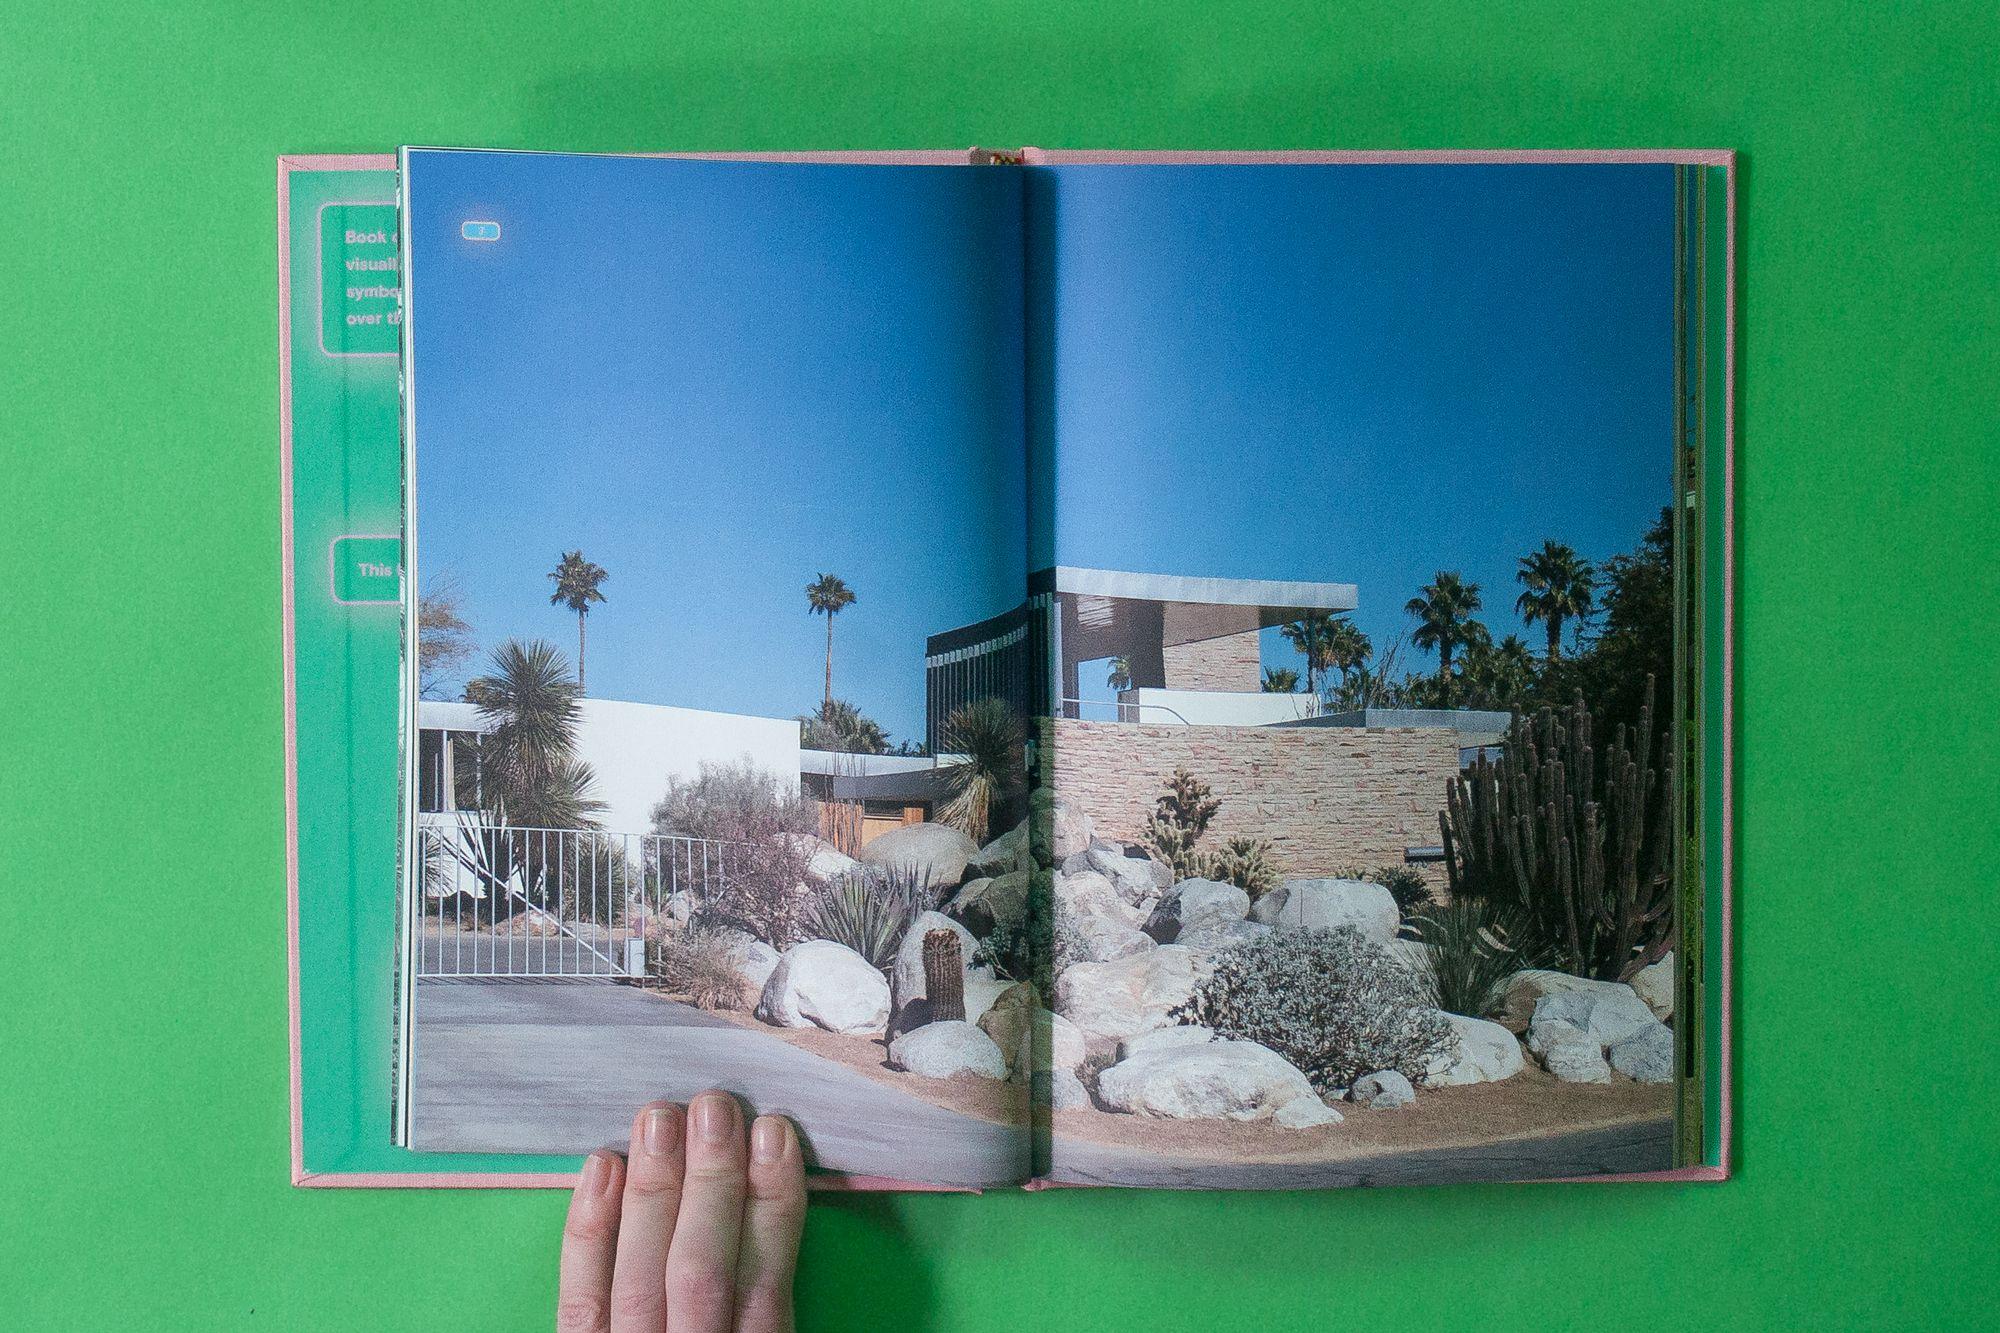 Book of Palms Volume 01 California